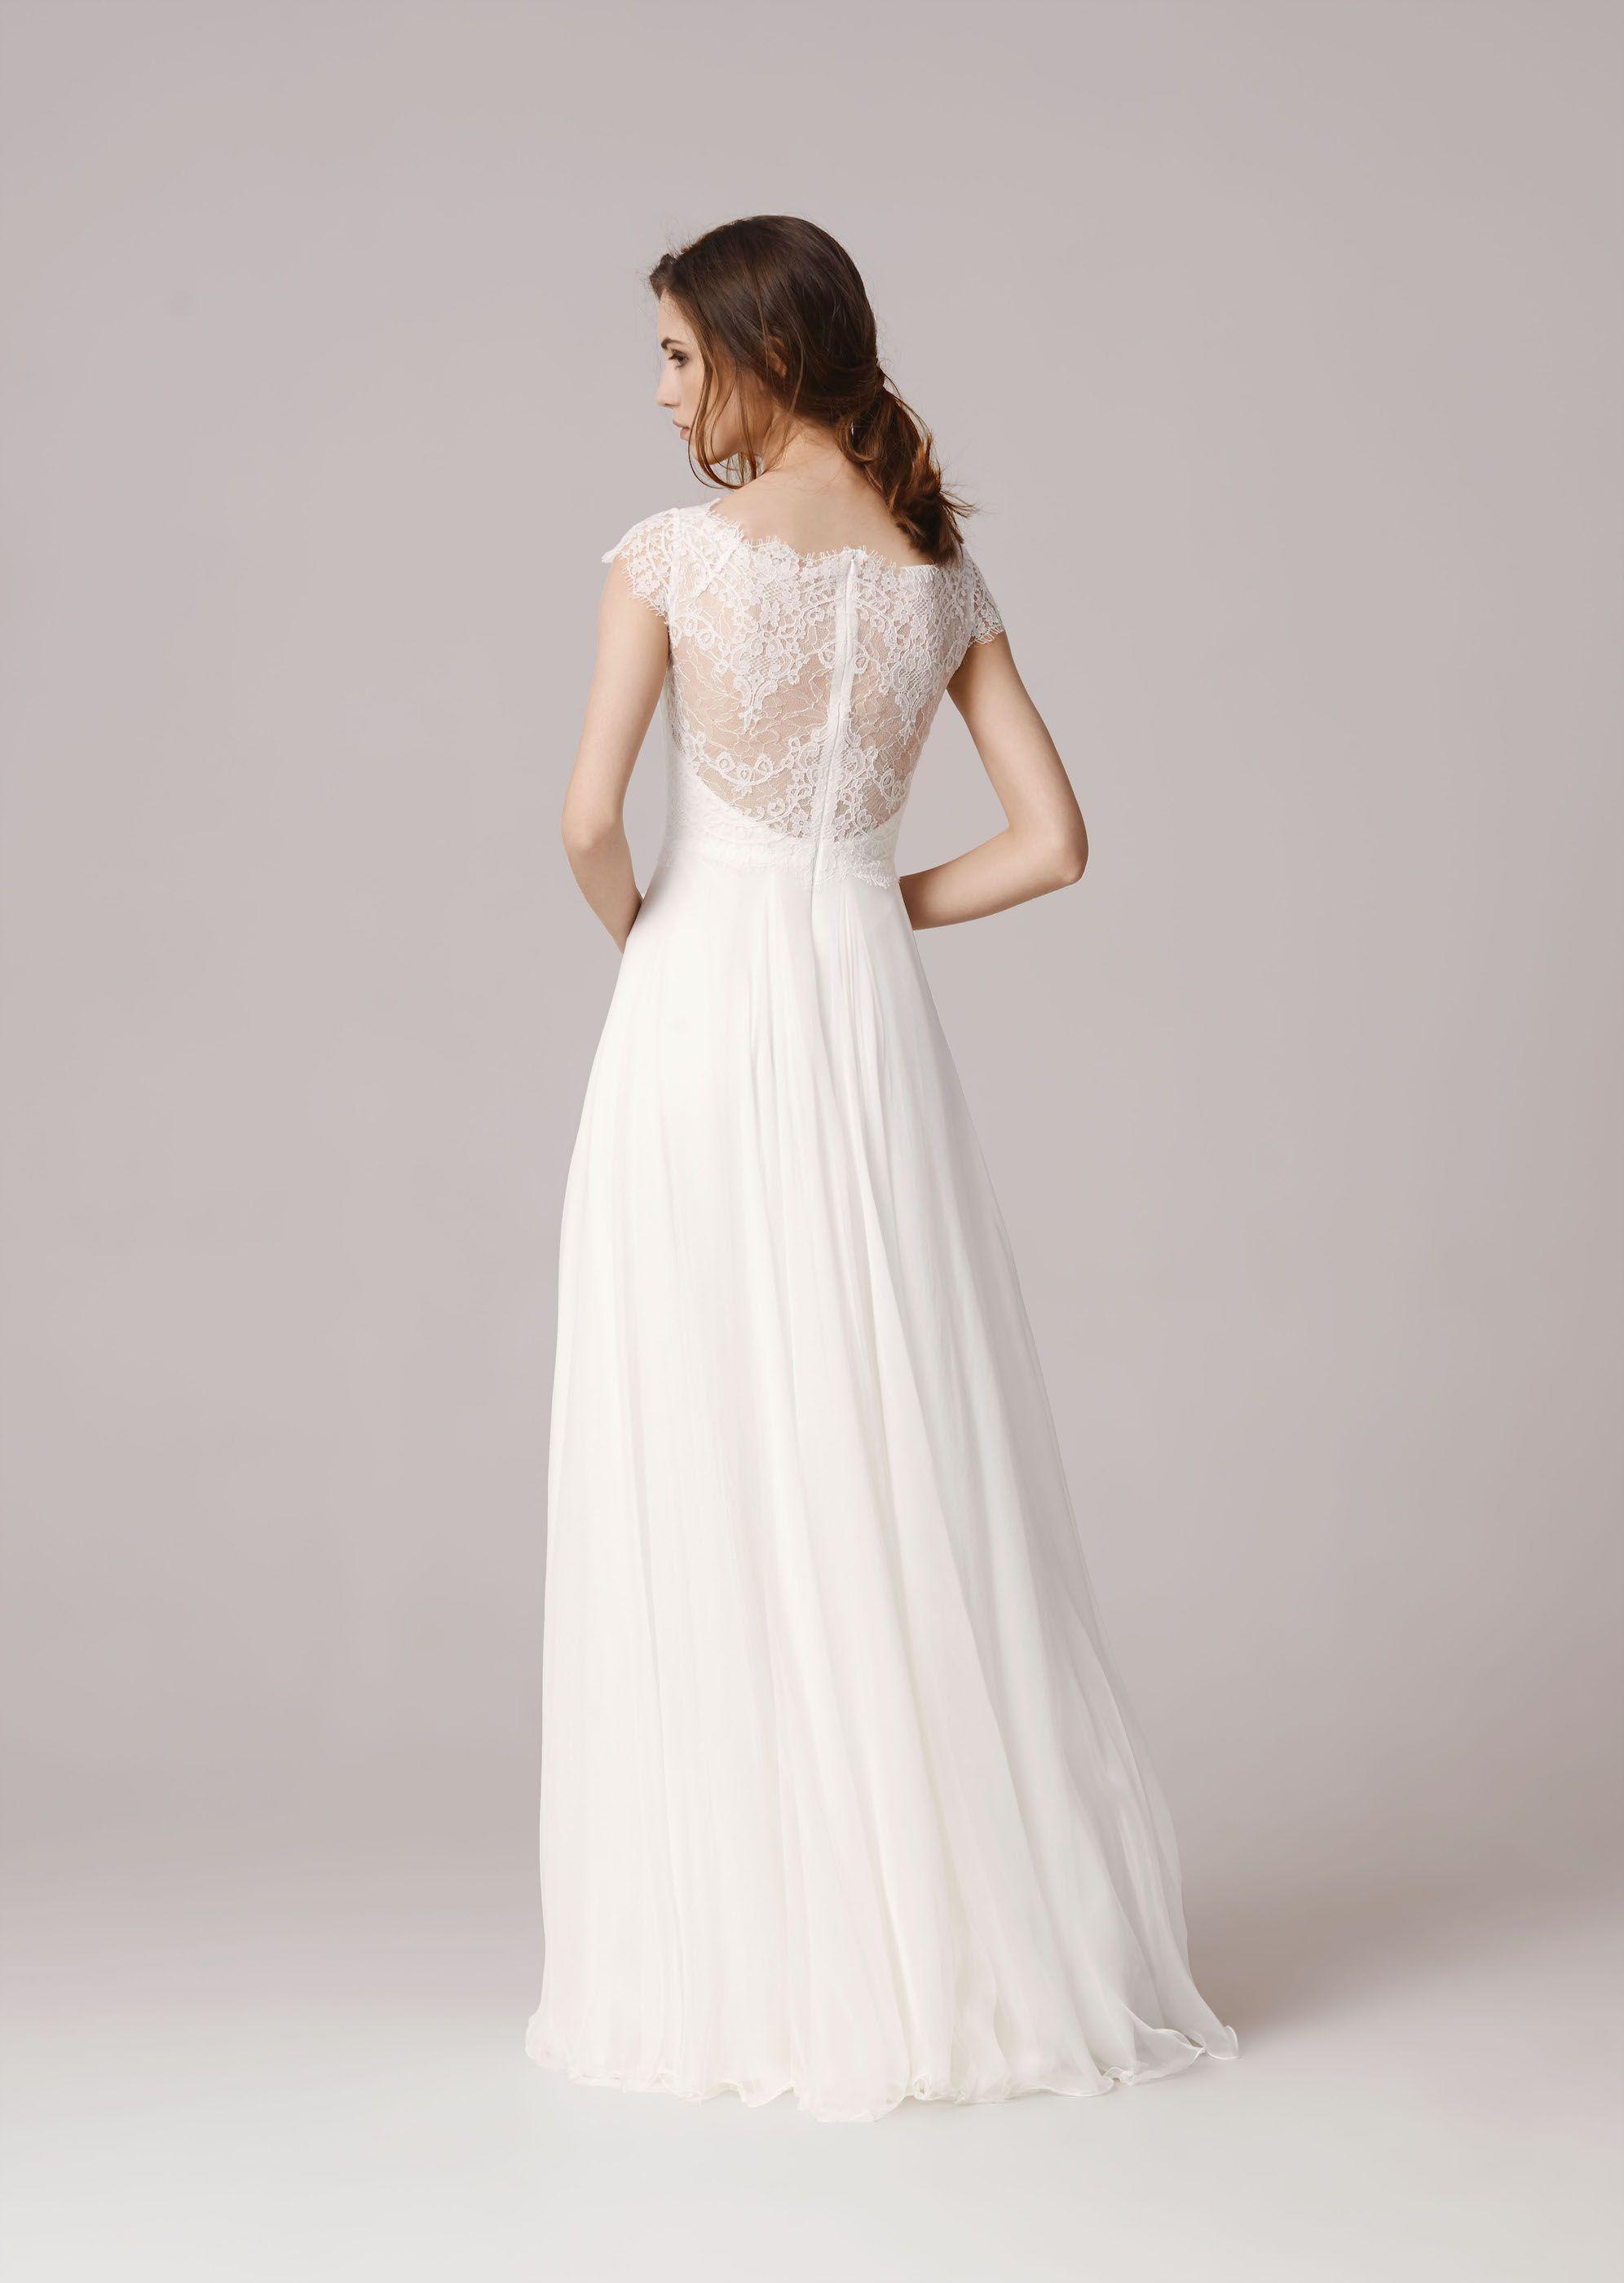 Anna Kara – THEA WHITE back | Wedding dresses + shoes | Pinterest ...